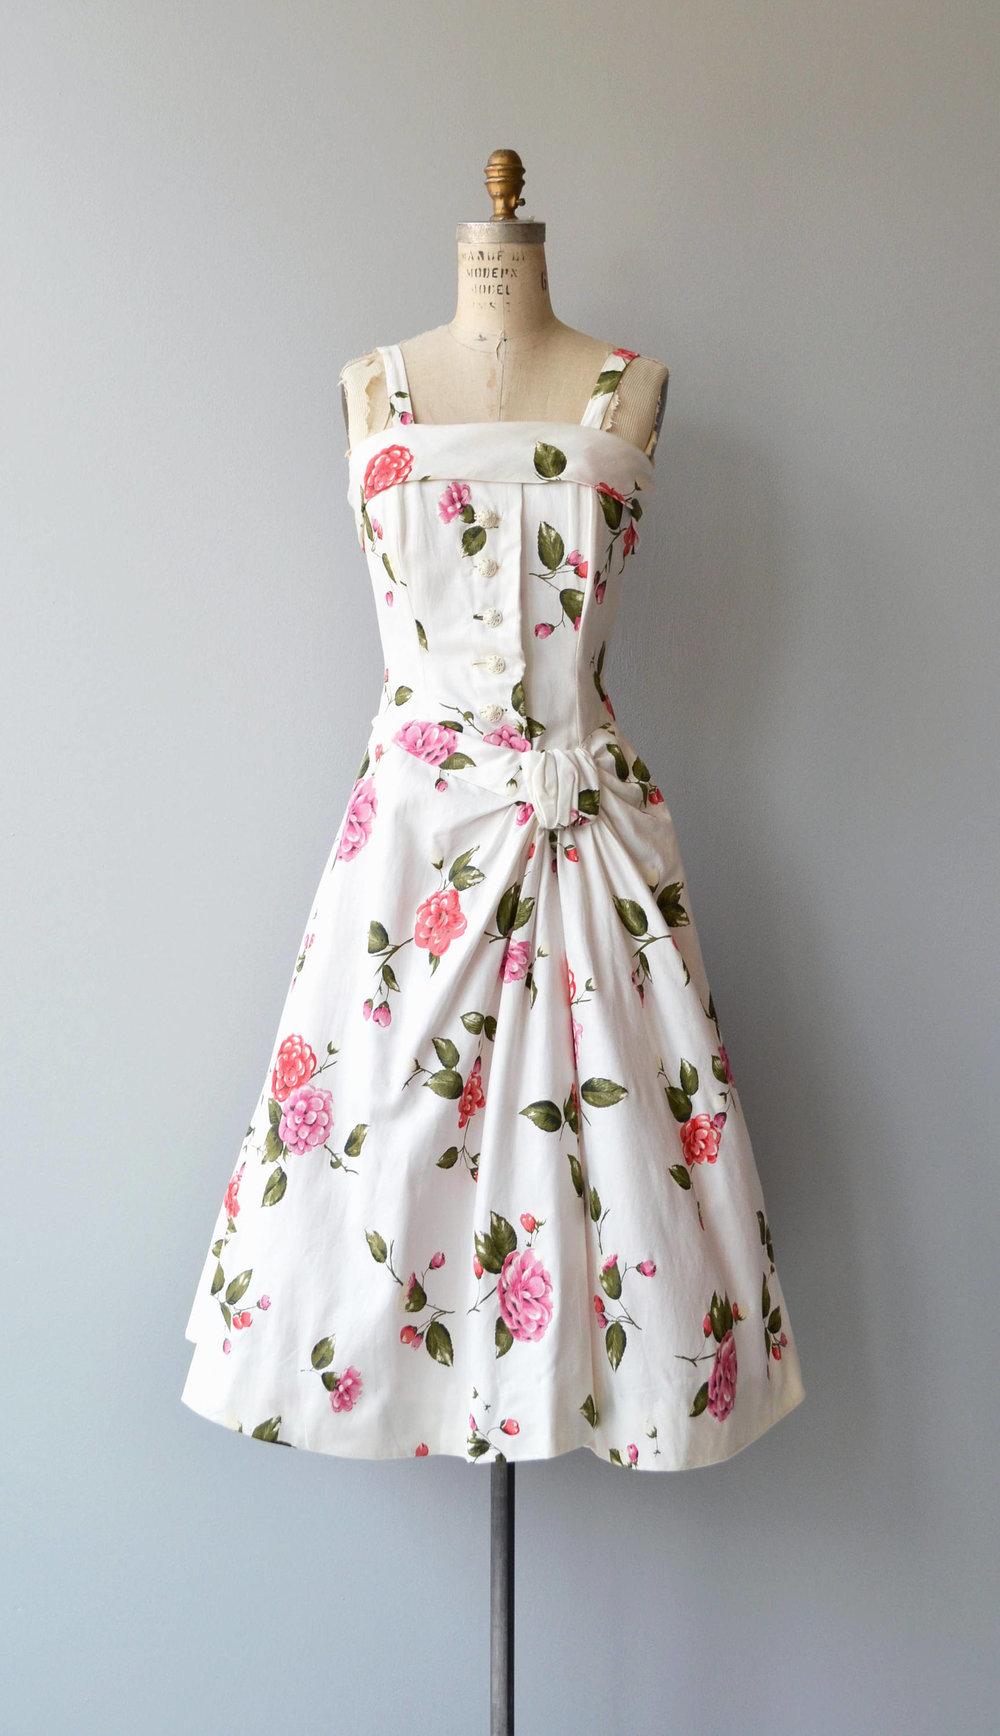 1950s Floral Cotton Dress with Hip Detail via Etsy